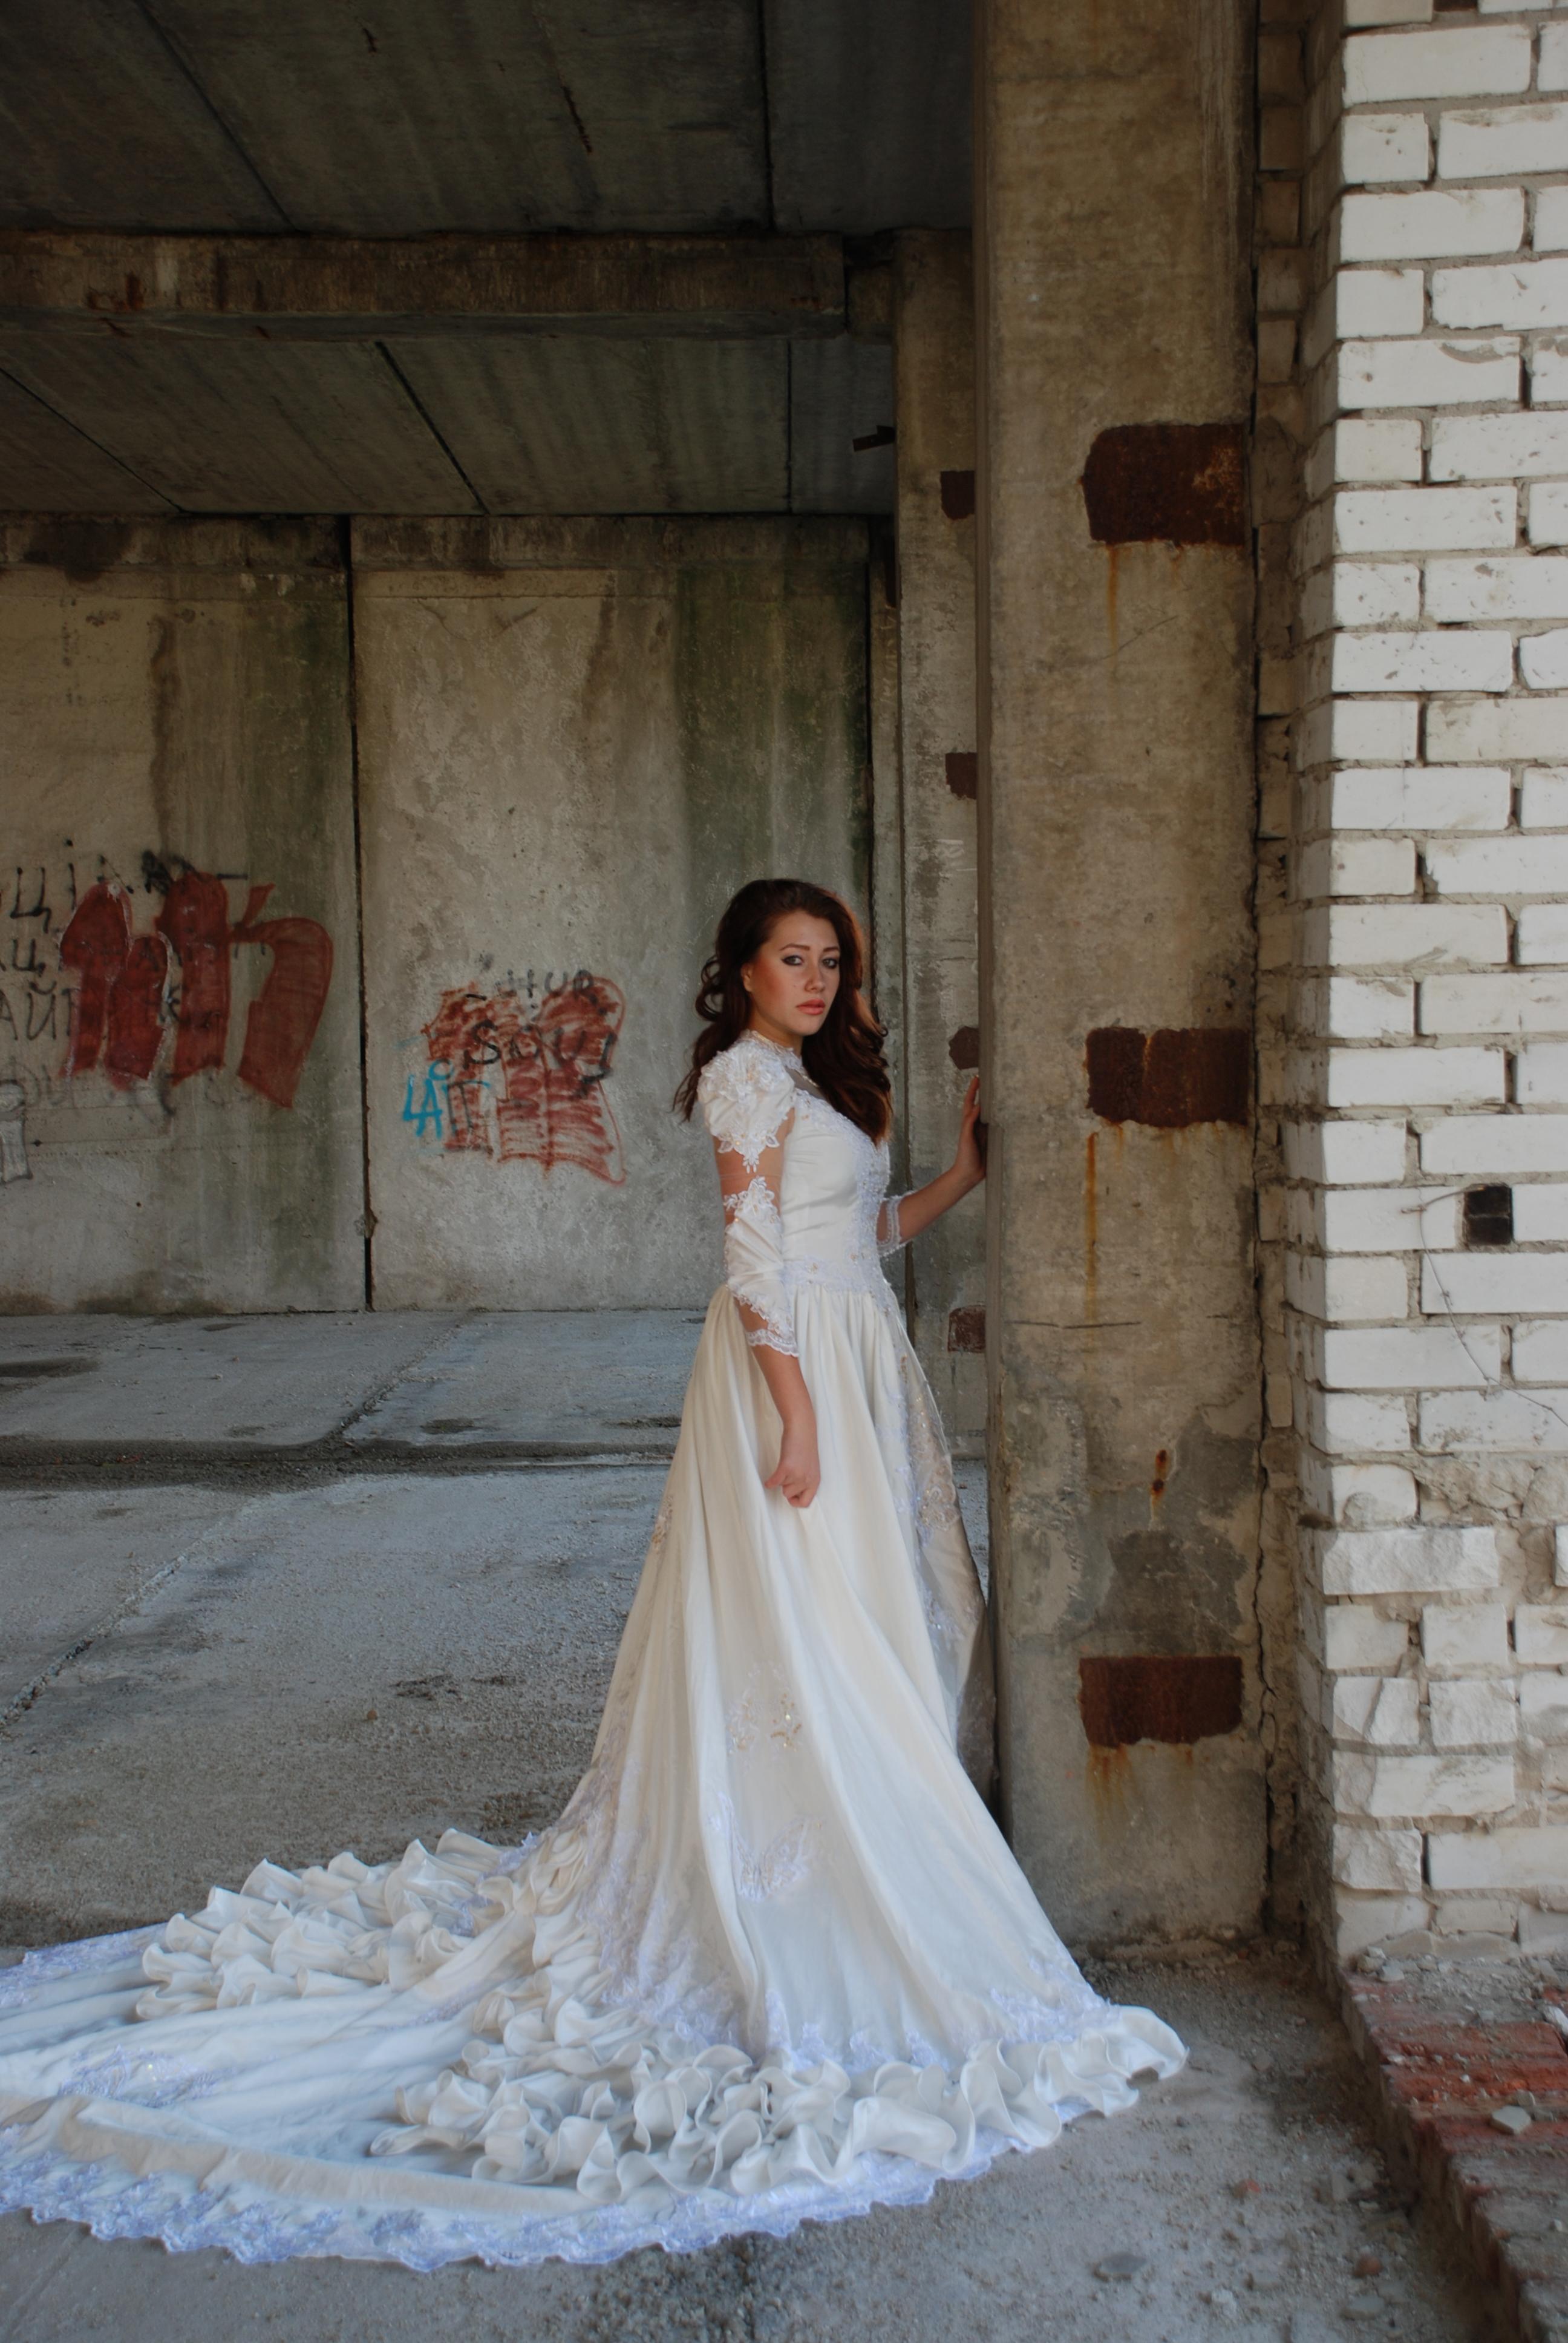 The sad bride_7 by anastasiya-landa